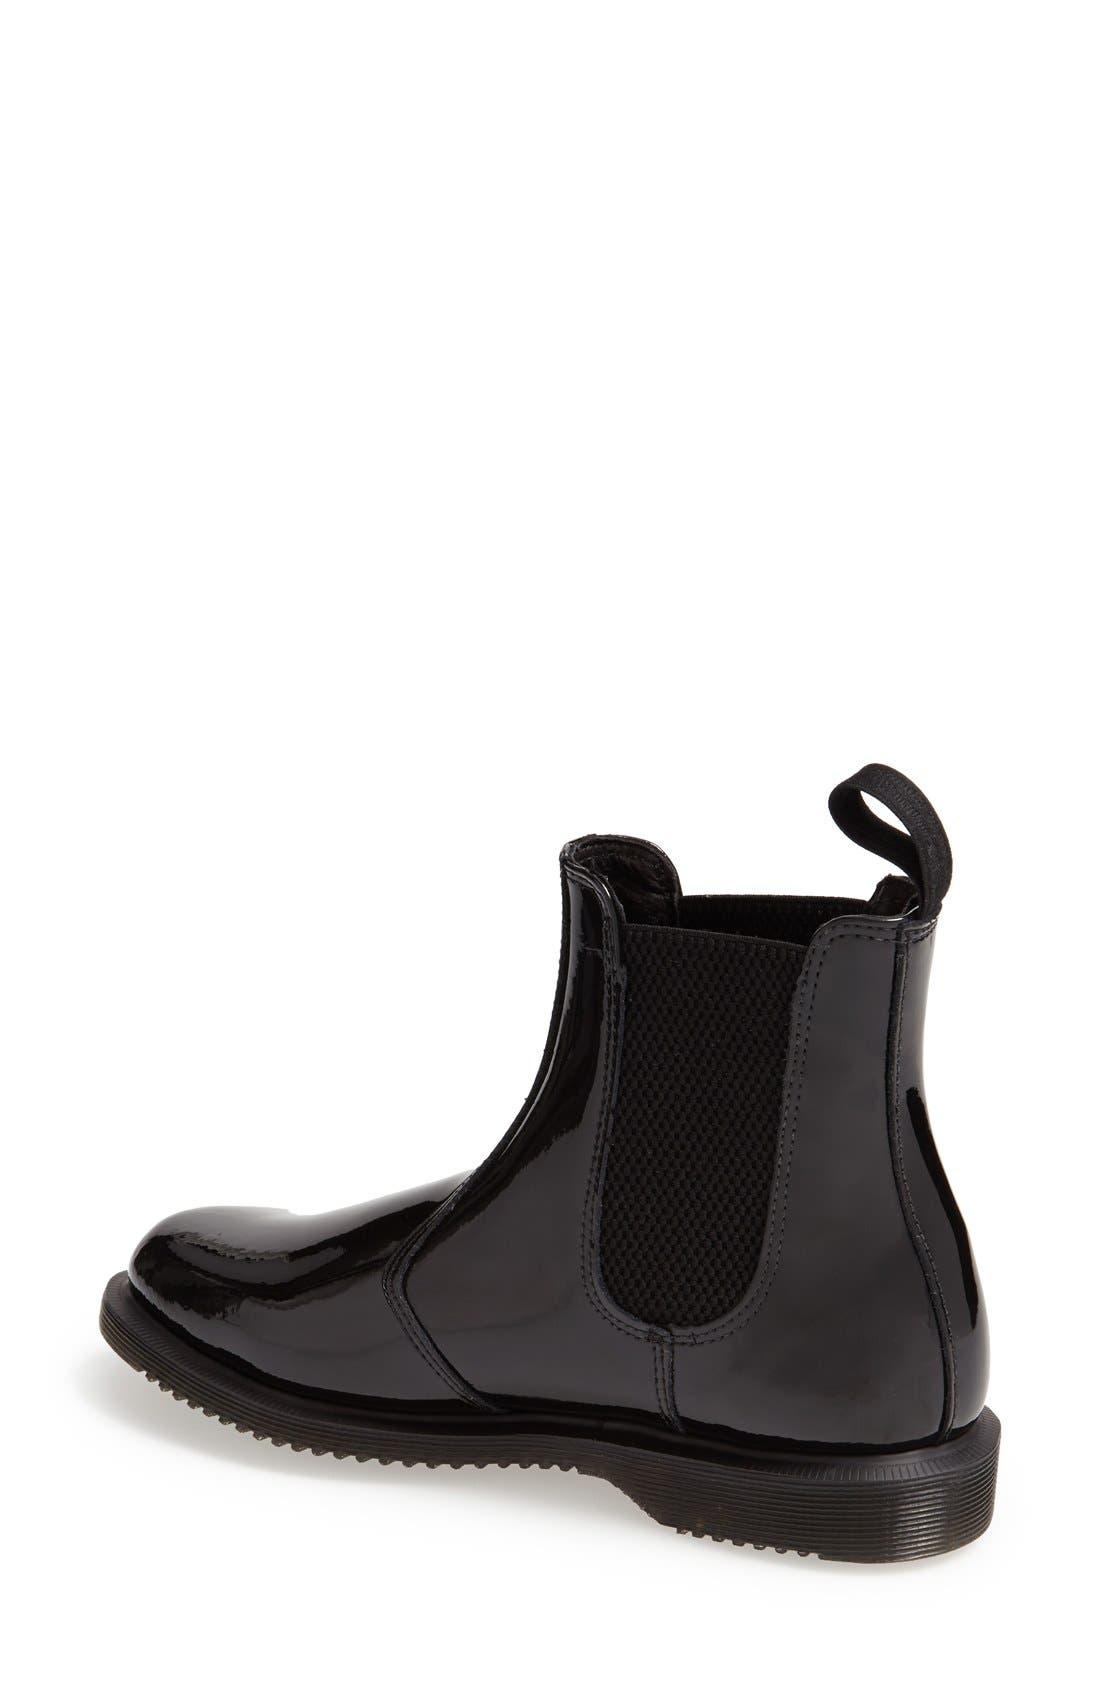 Alternate Image 2  - Dr. Martens 'Faun' Patent Chelsea Boot (Women)